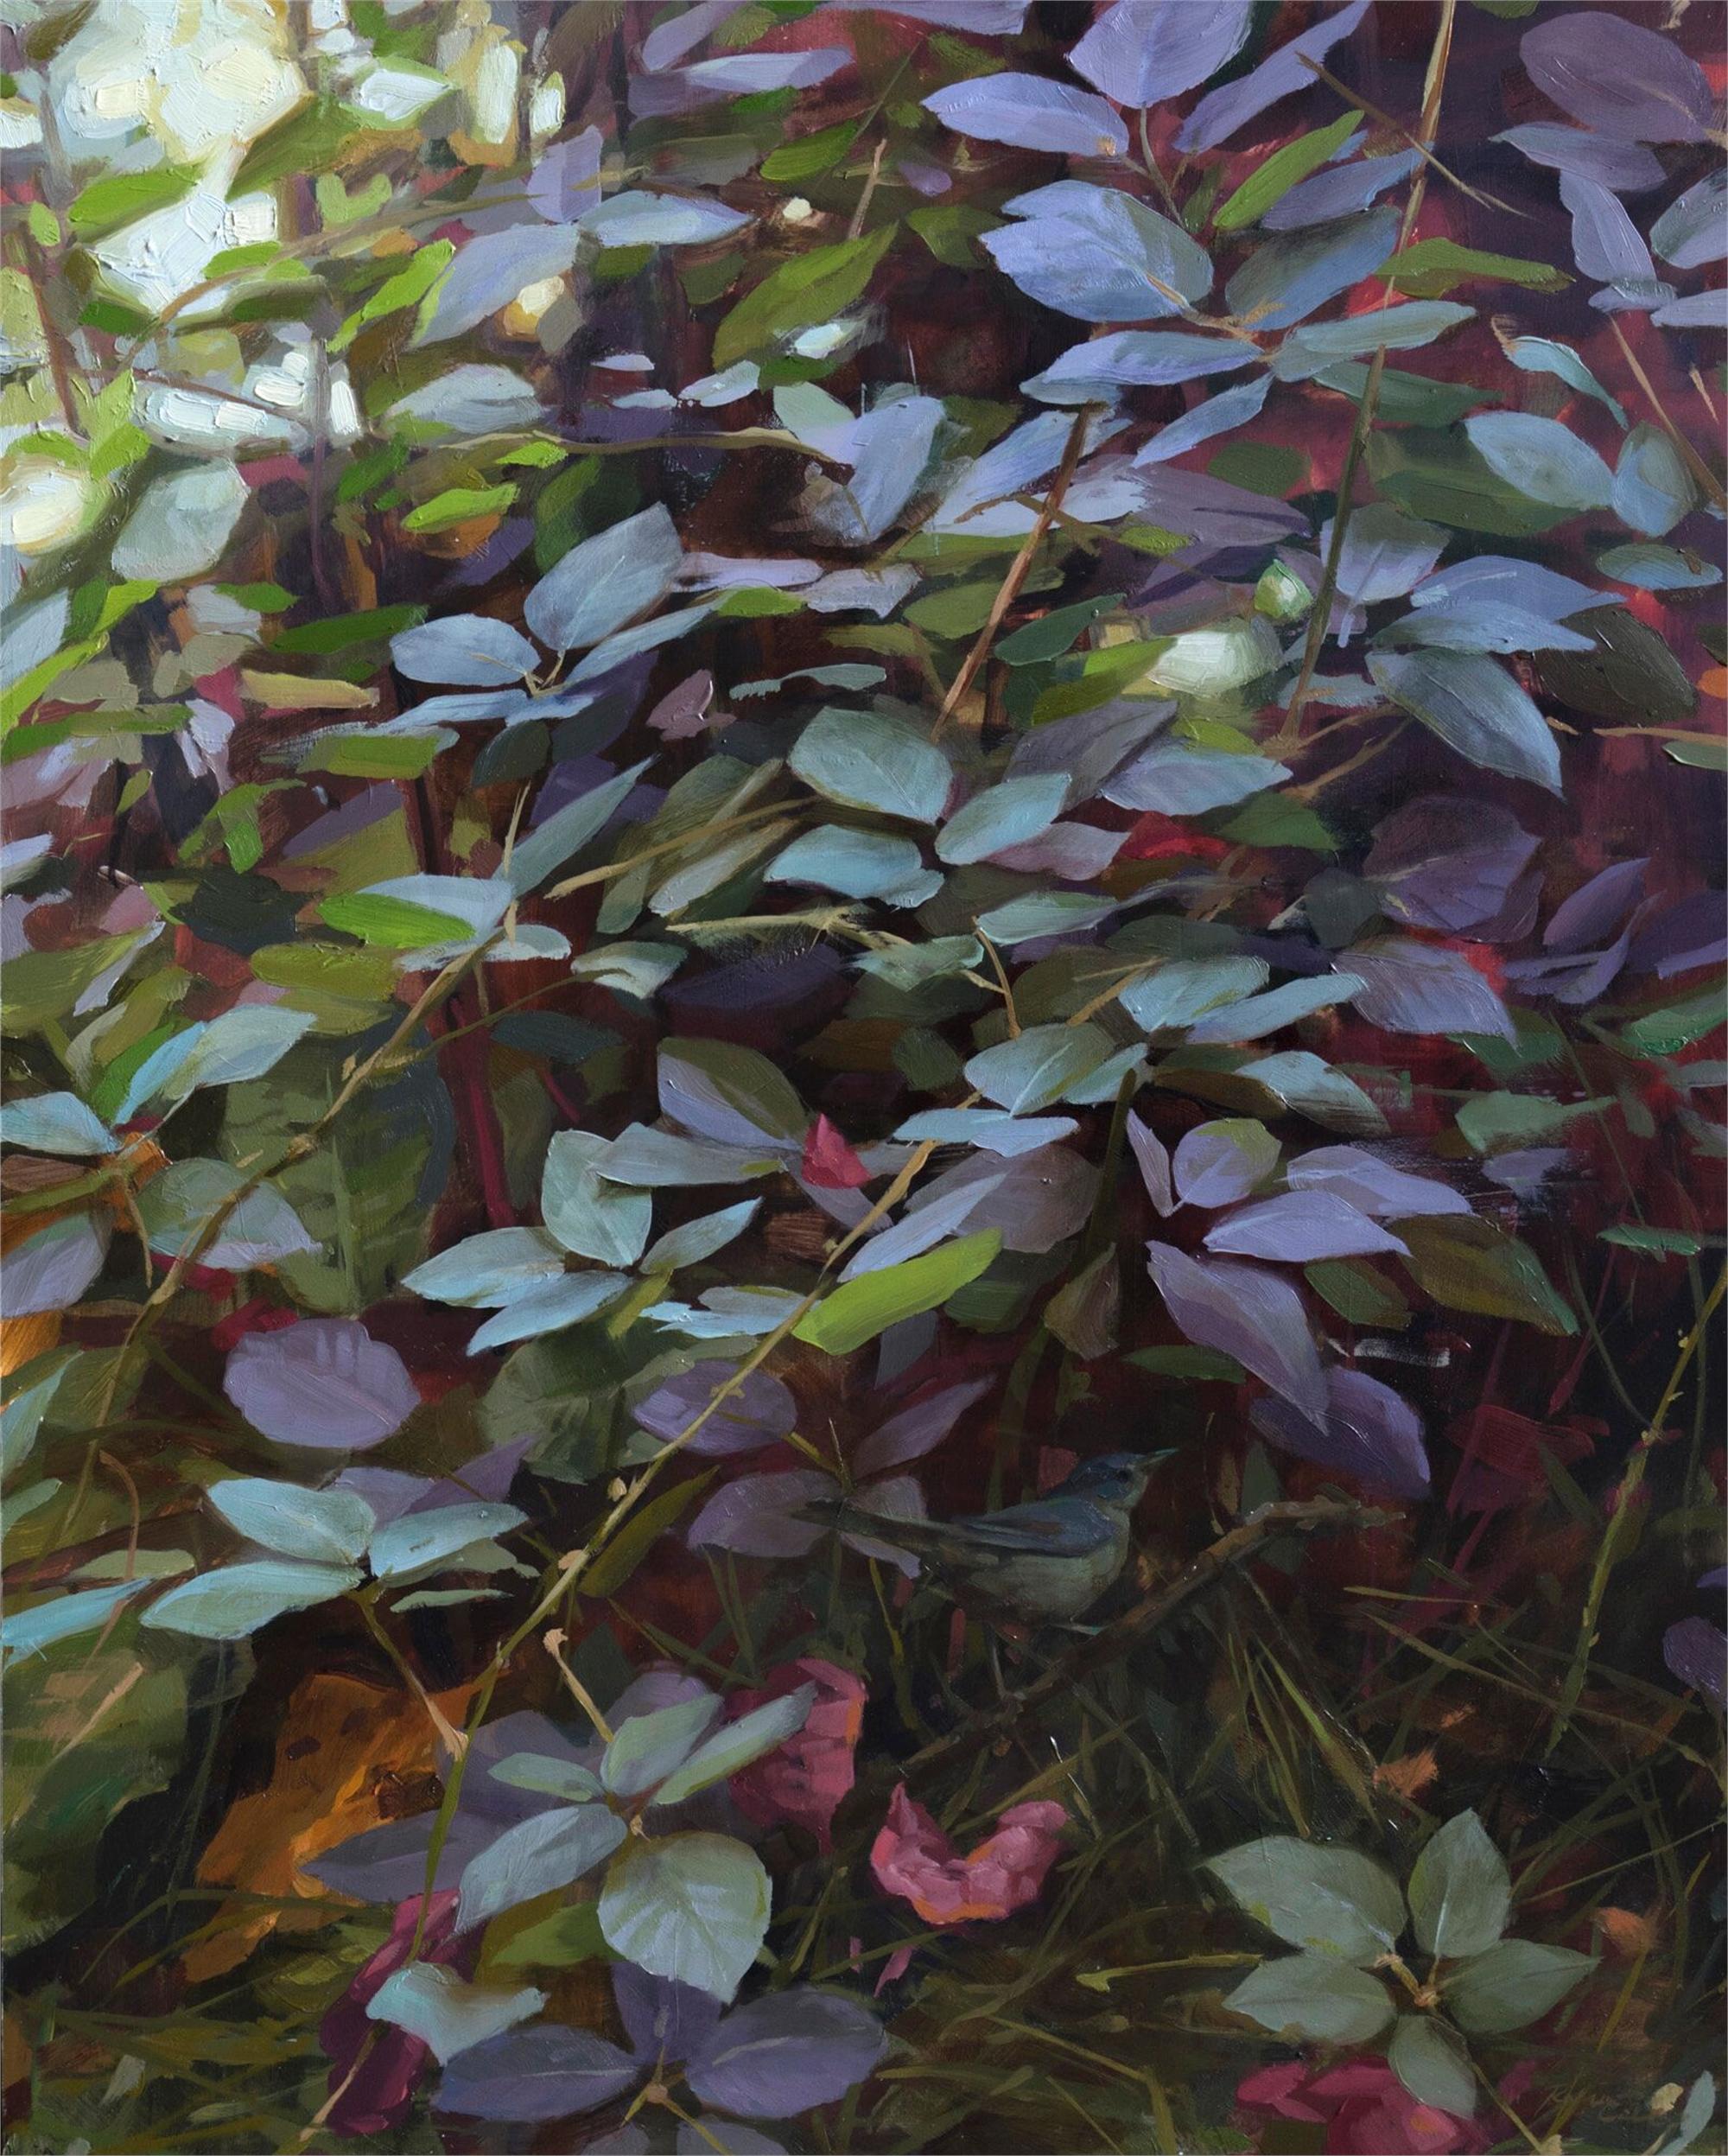 Shrike by Robin Cole